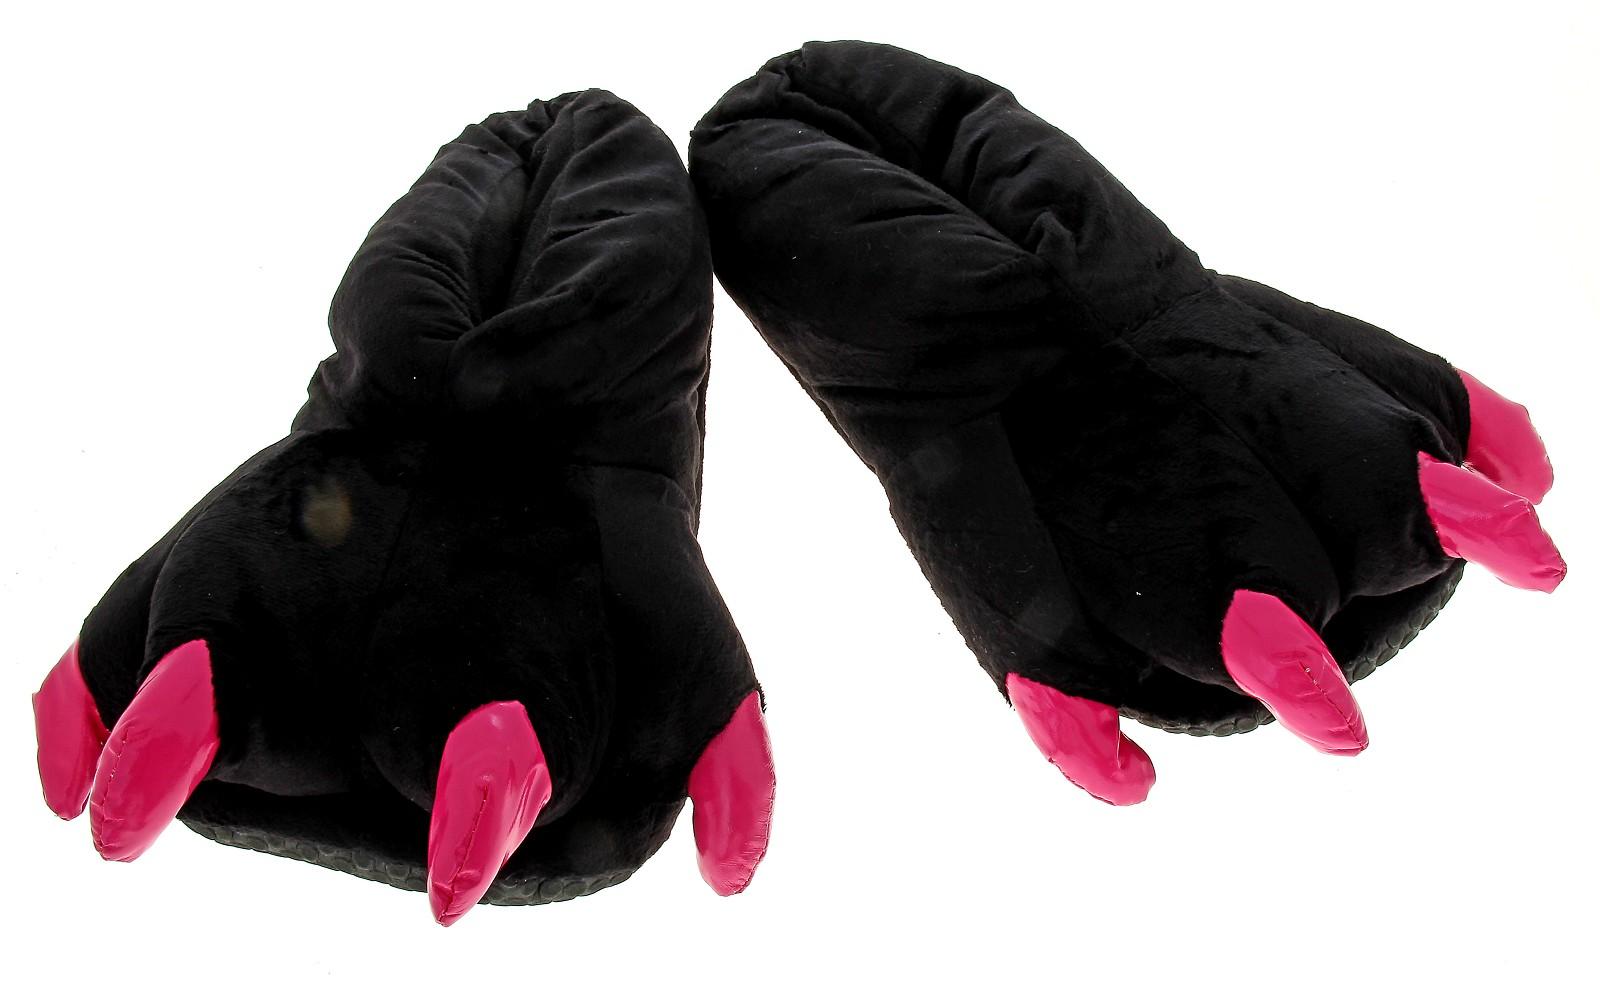 Тапочки-лапы  модели с лапами медведя, лапки волка f1b682edb4f